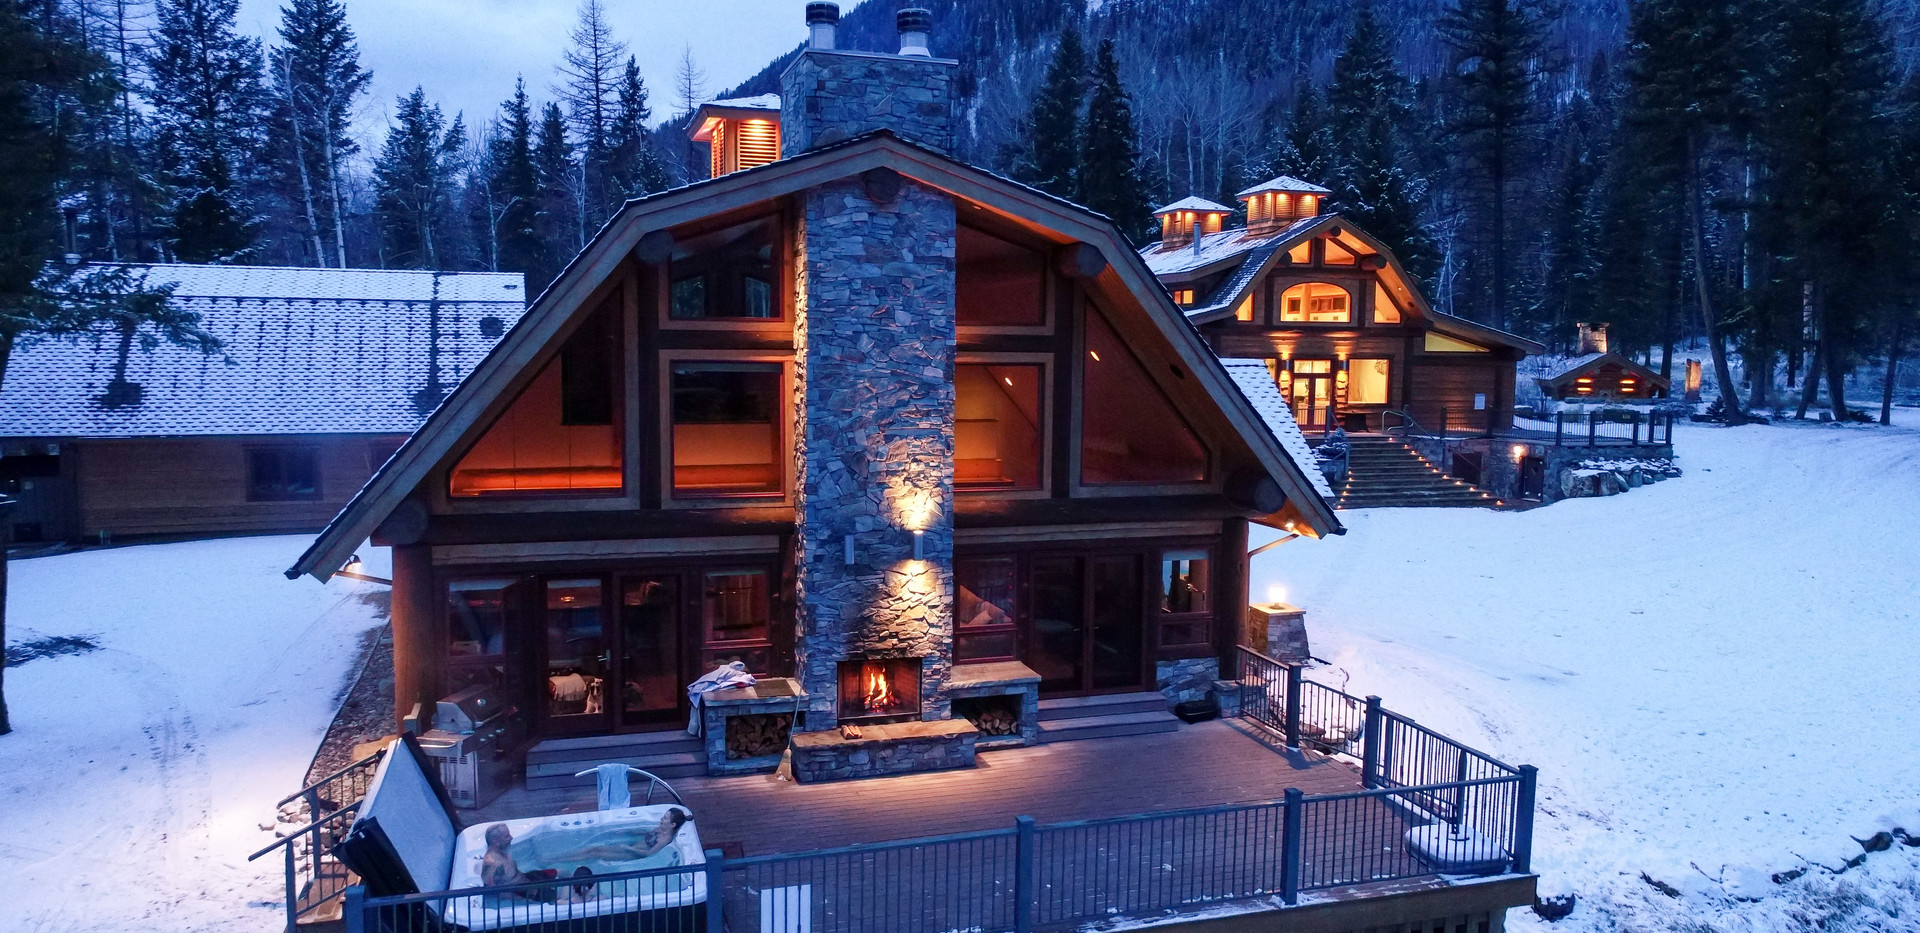 Winter Cabin Deck